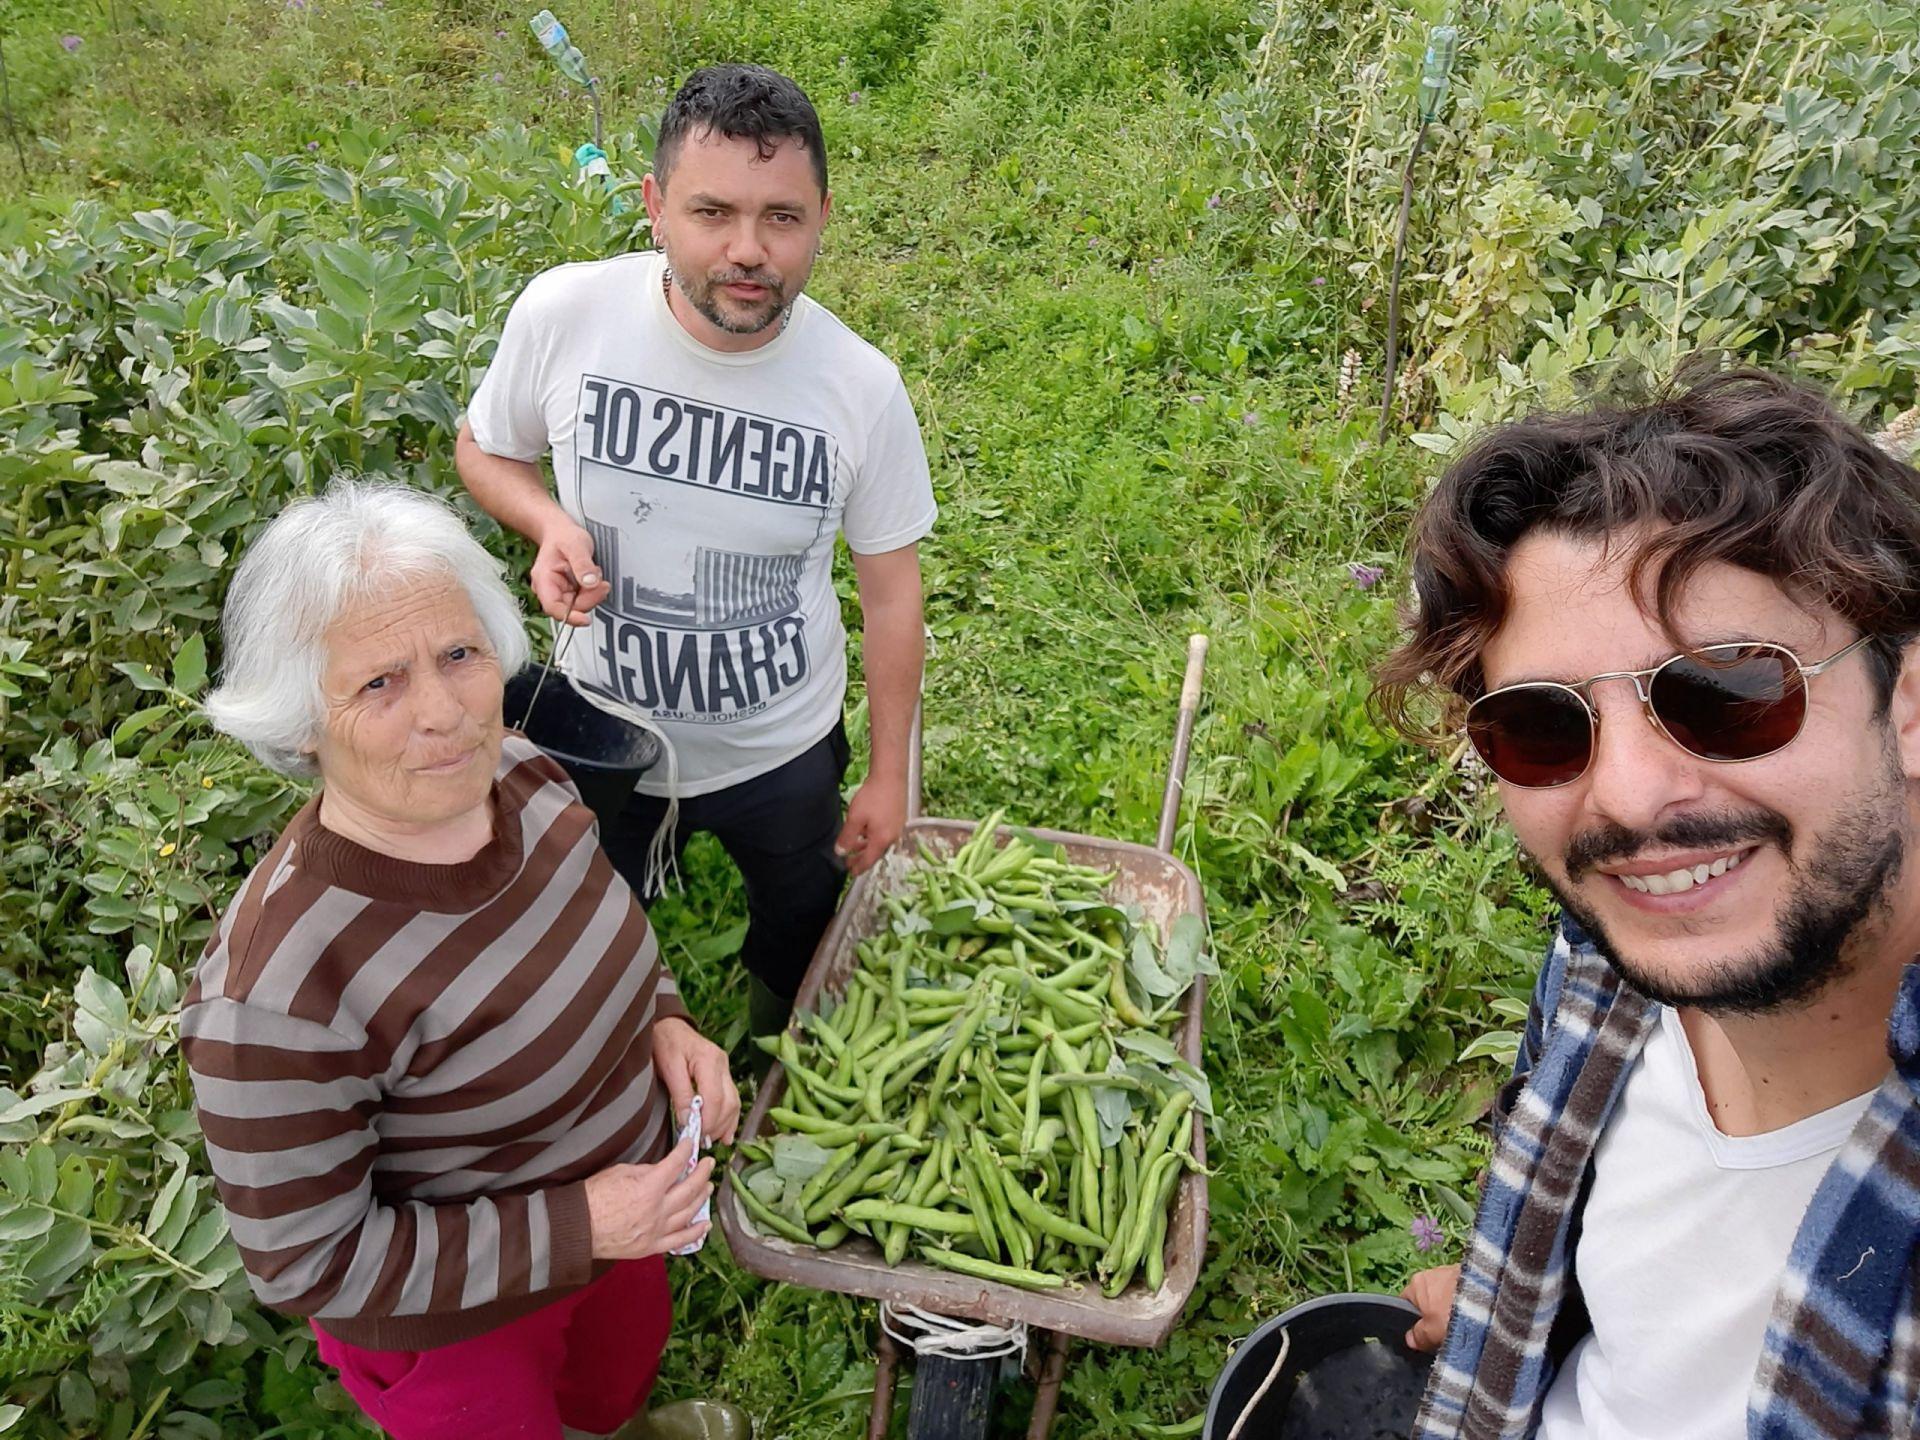 La Corriera Contadina Azienda Agricola Biologica Jalari